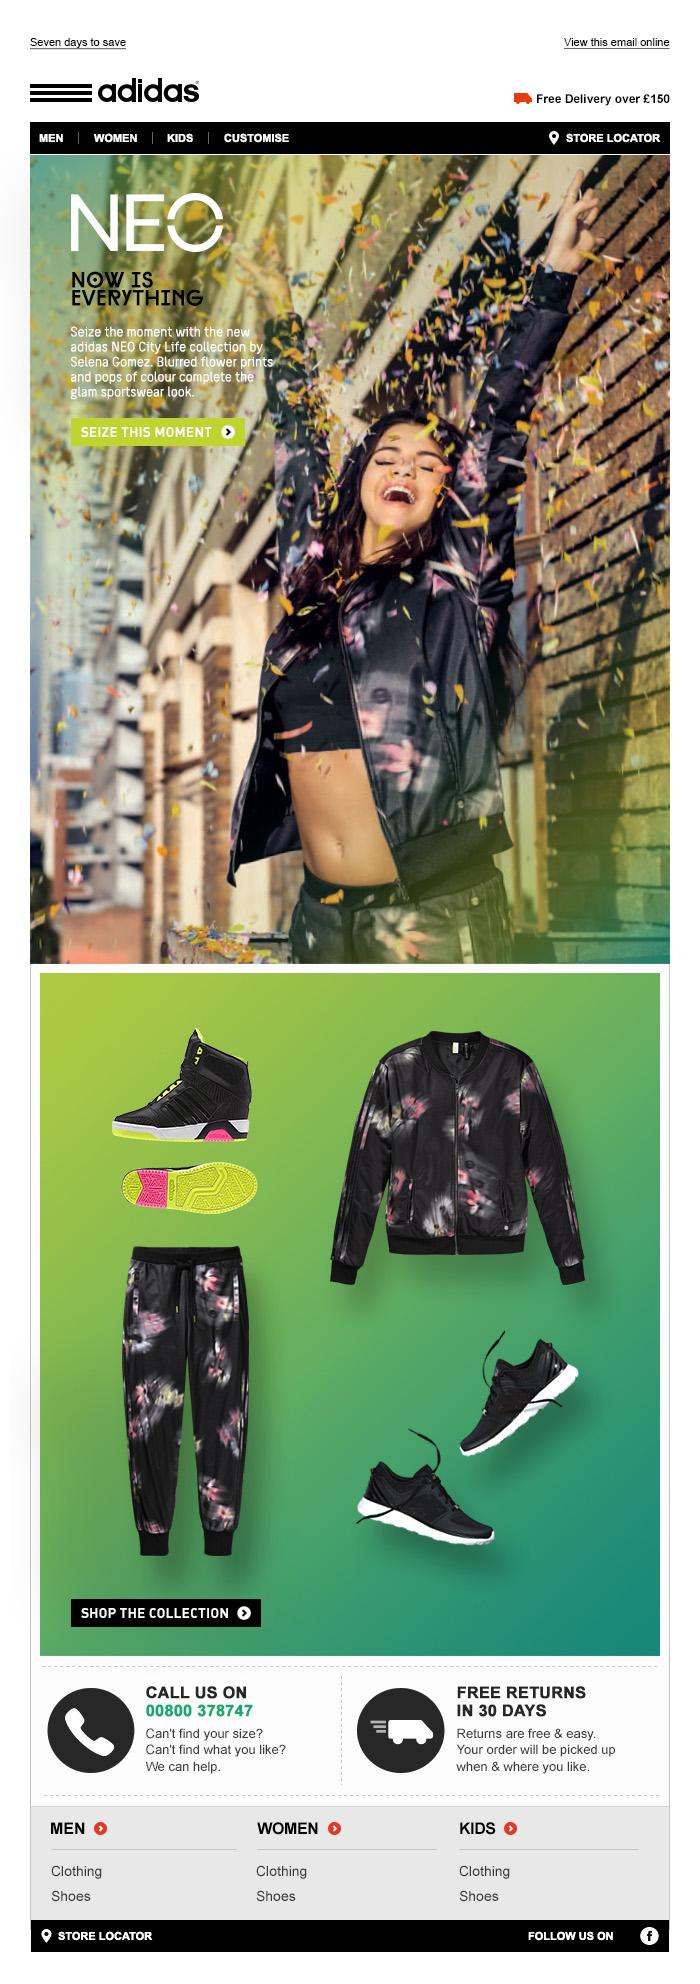 adidas NEO Selena Gomez - Tim Tayyar, freelance copywriter